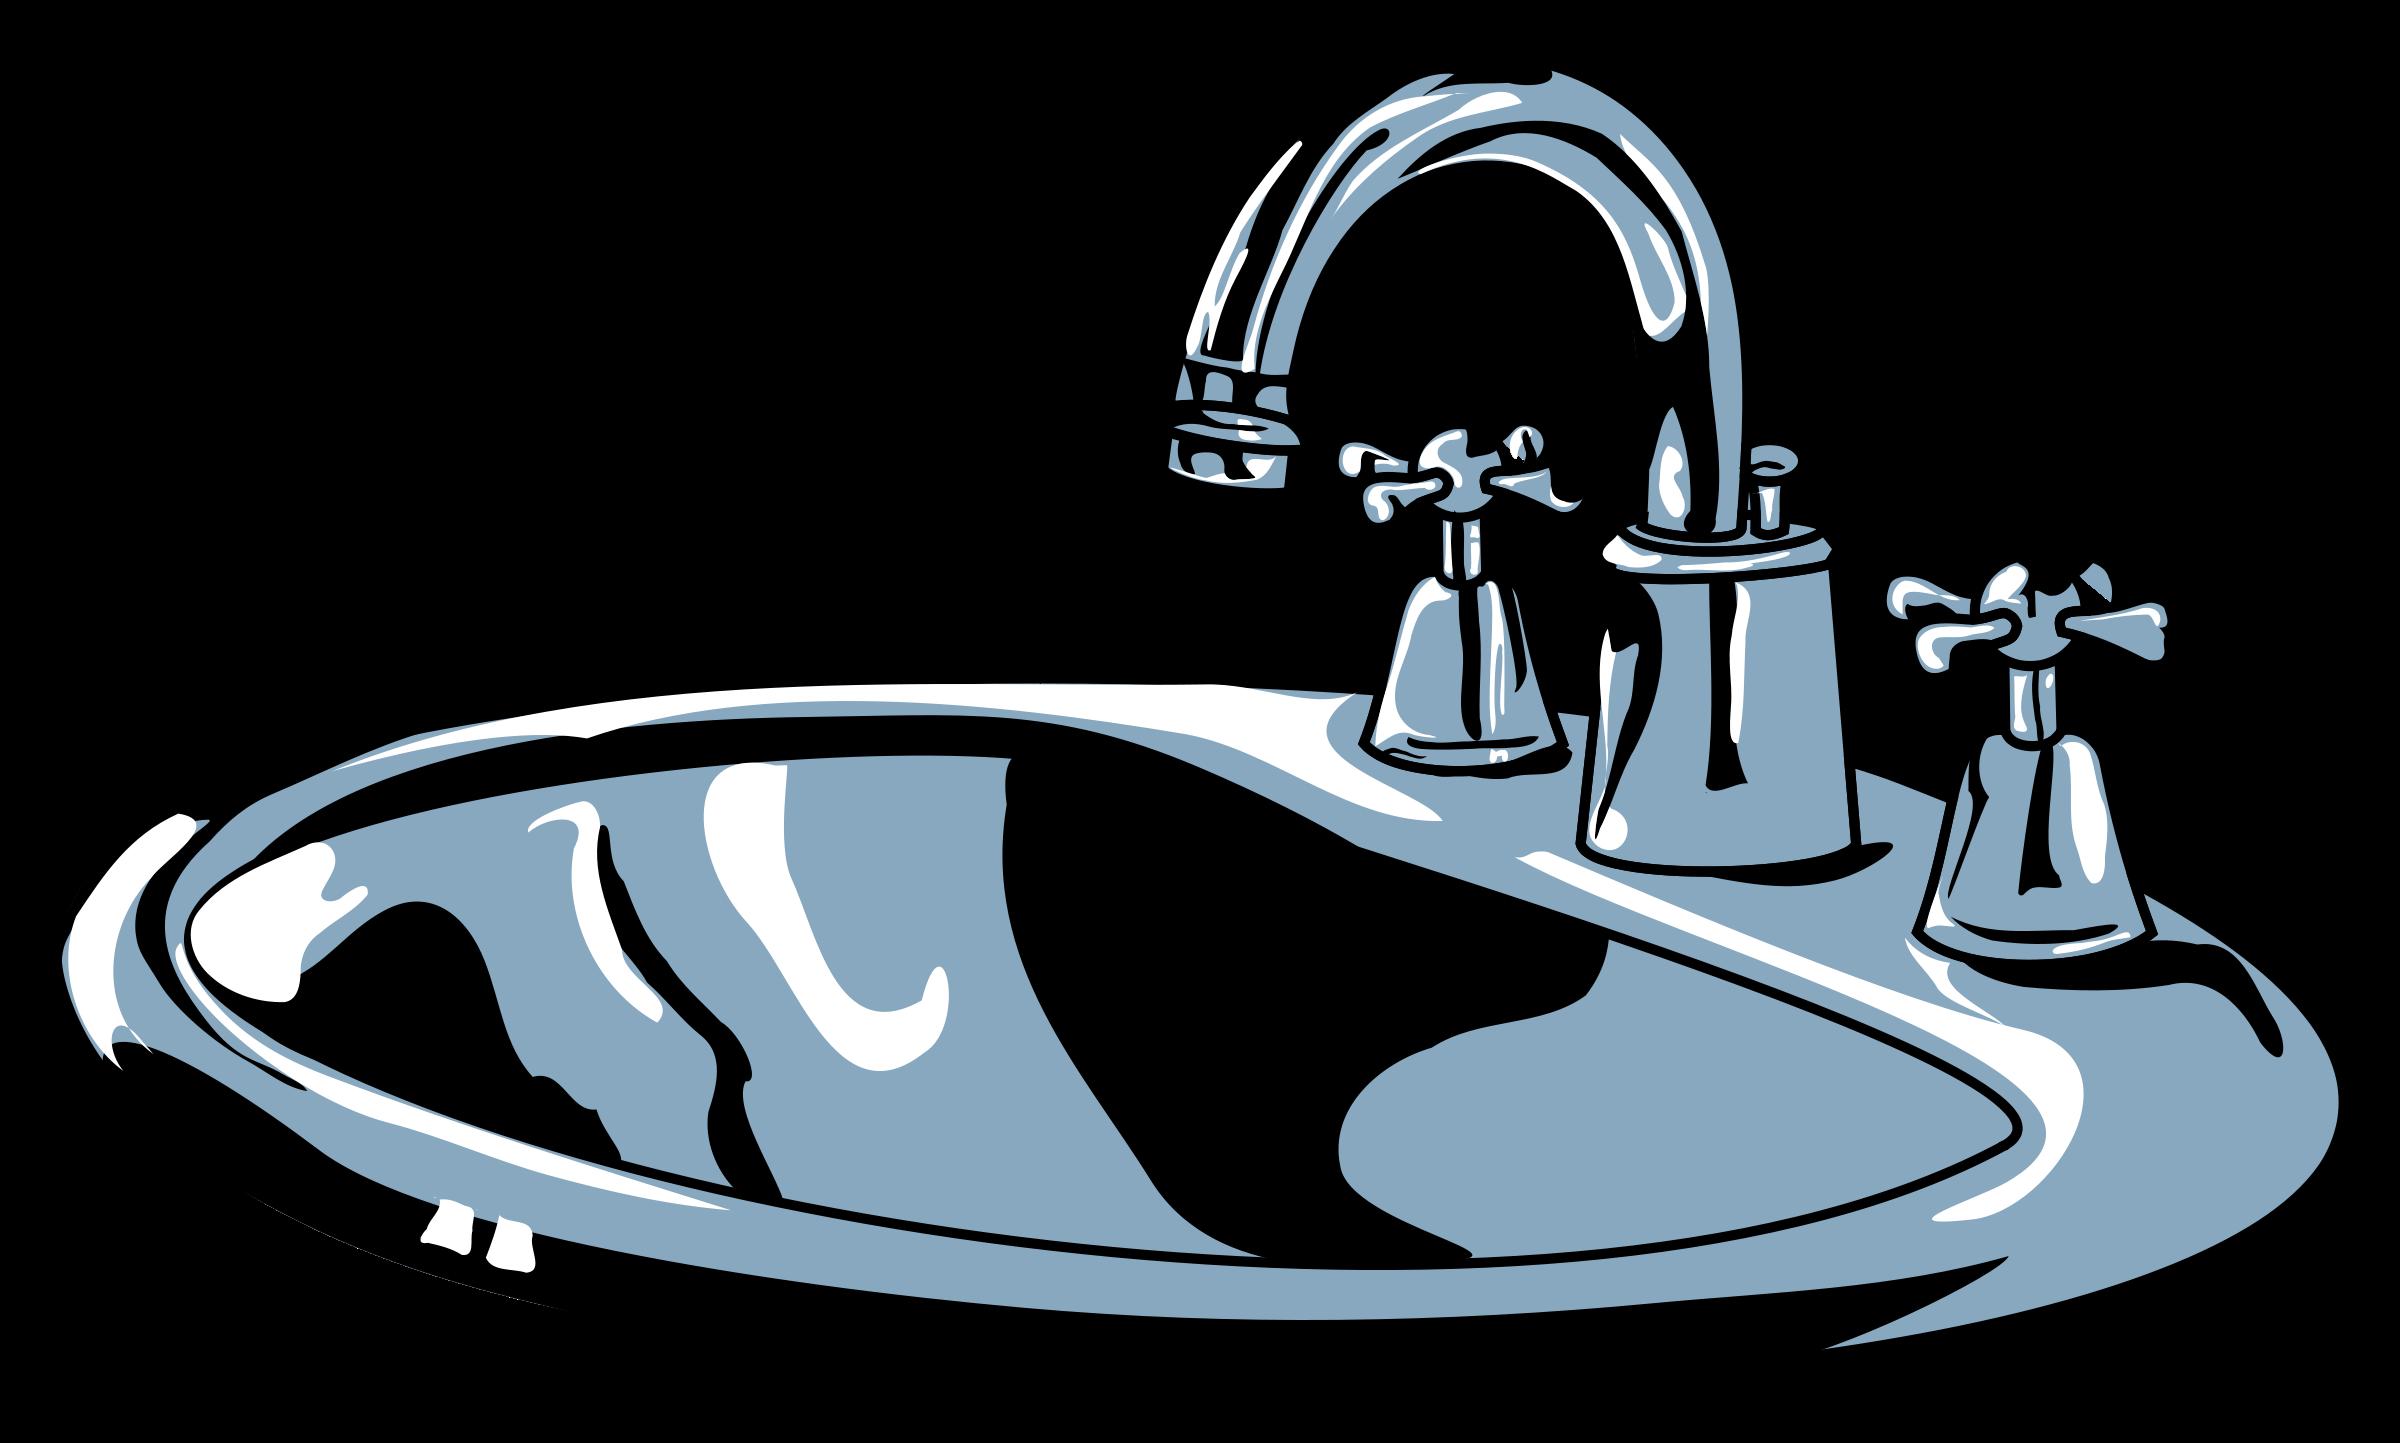 Faucet clipart water treatment. Terrific clean bathroom clip